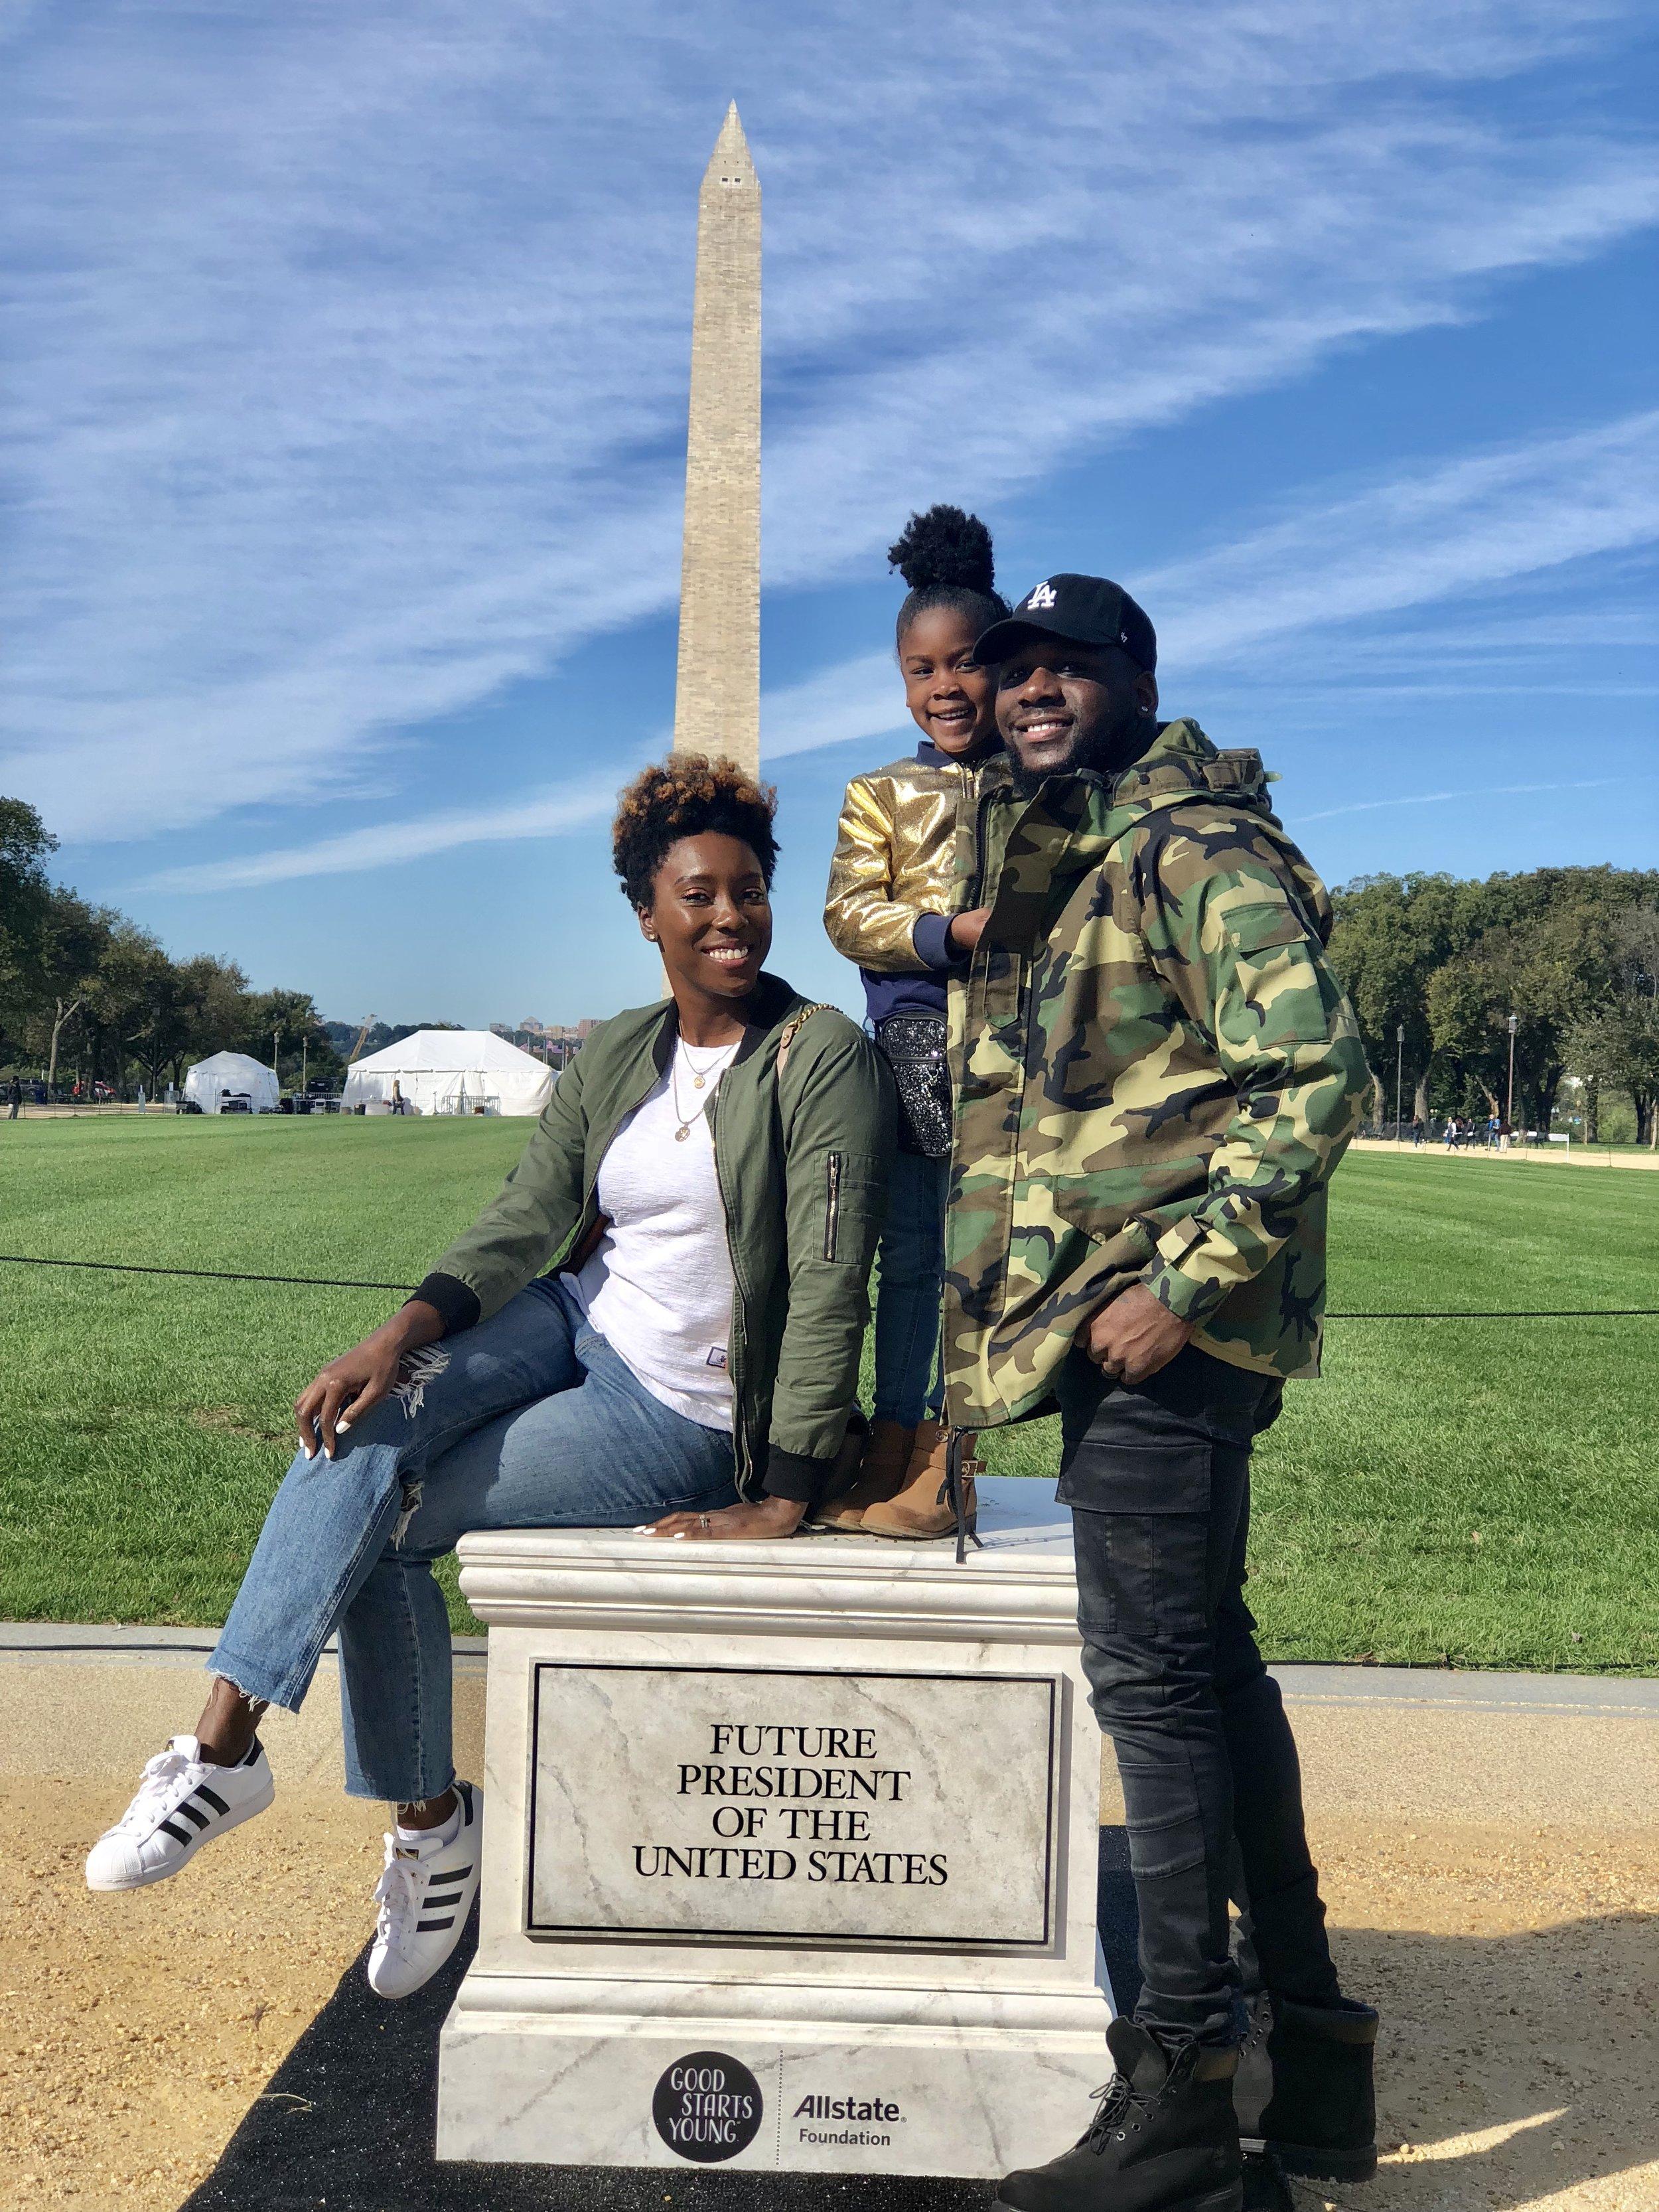 Allstate_Foundation_Good_Starts_Young_DC_Dayna_Bolden_Family_4.jpg